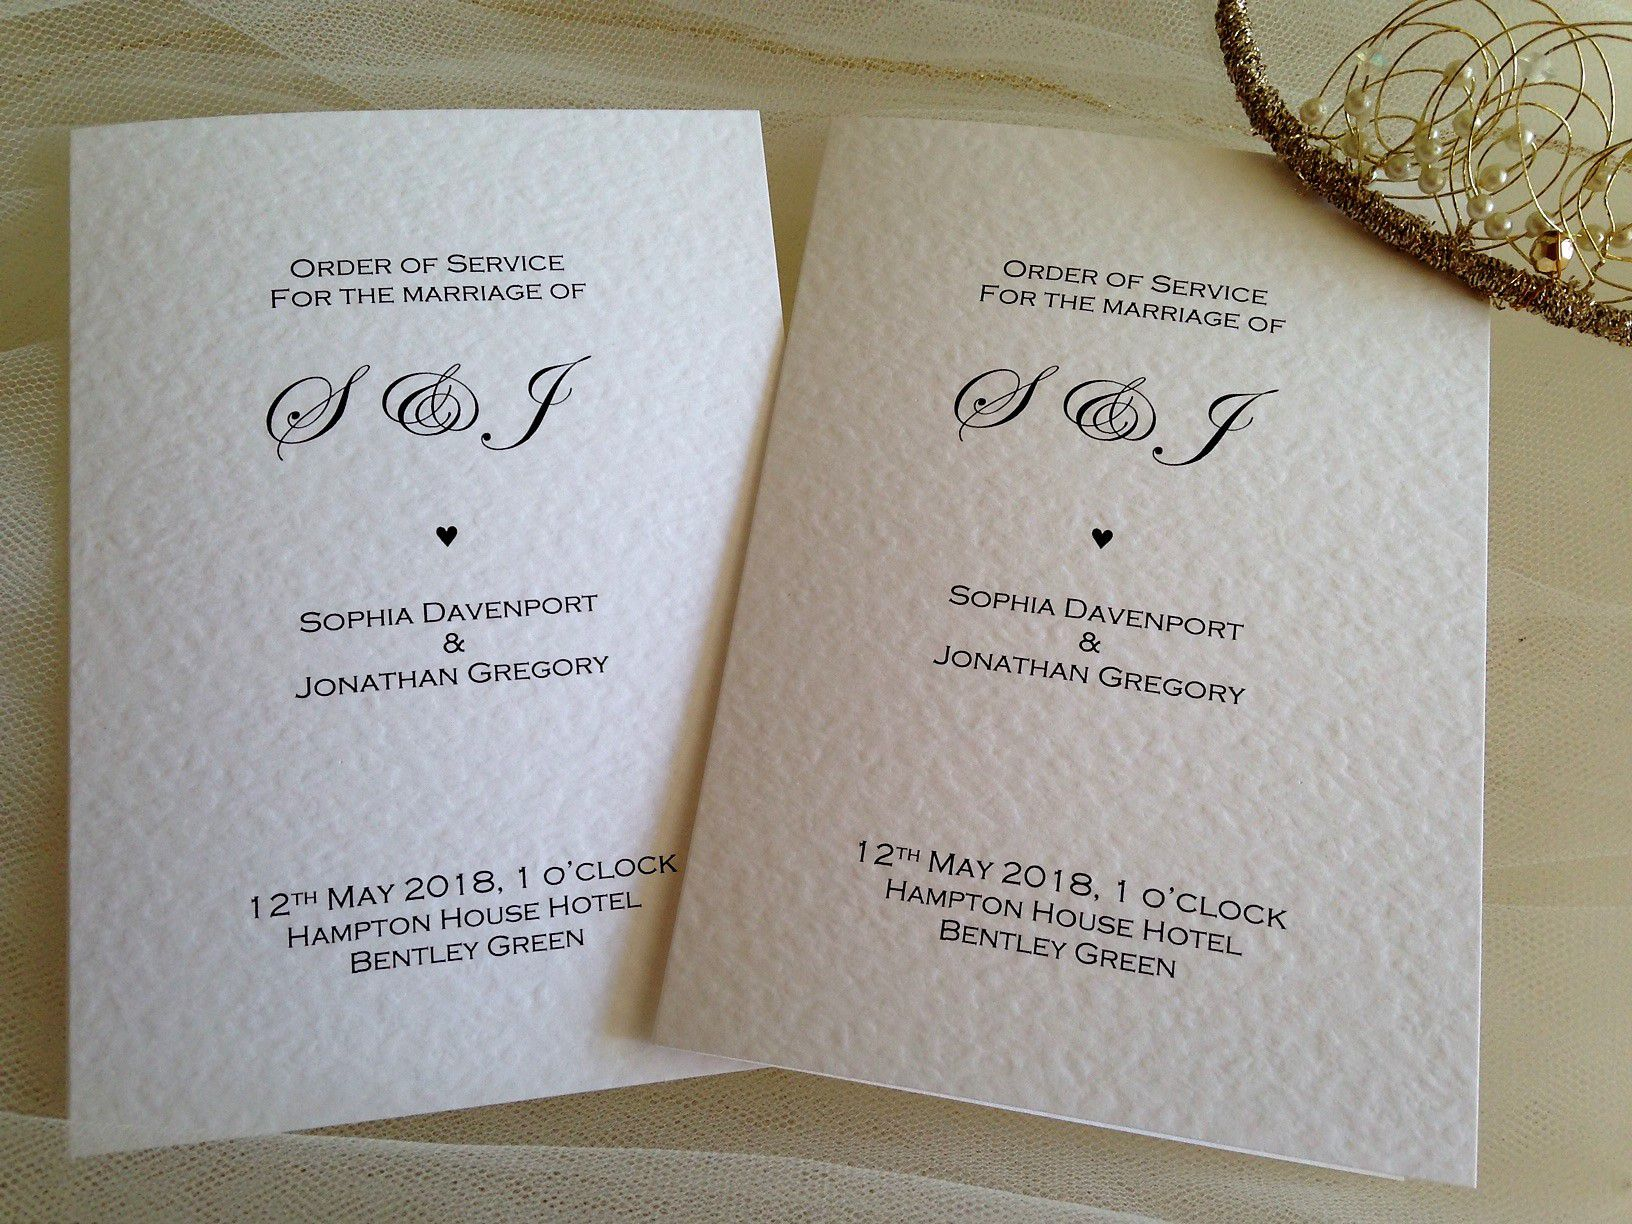 006 Shocking Wedding Order Of Service Template Example  Pdf Publisher Microsoft WordFull